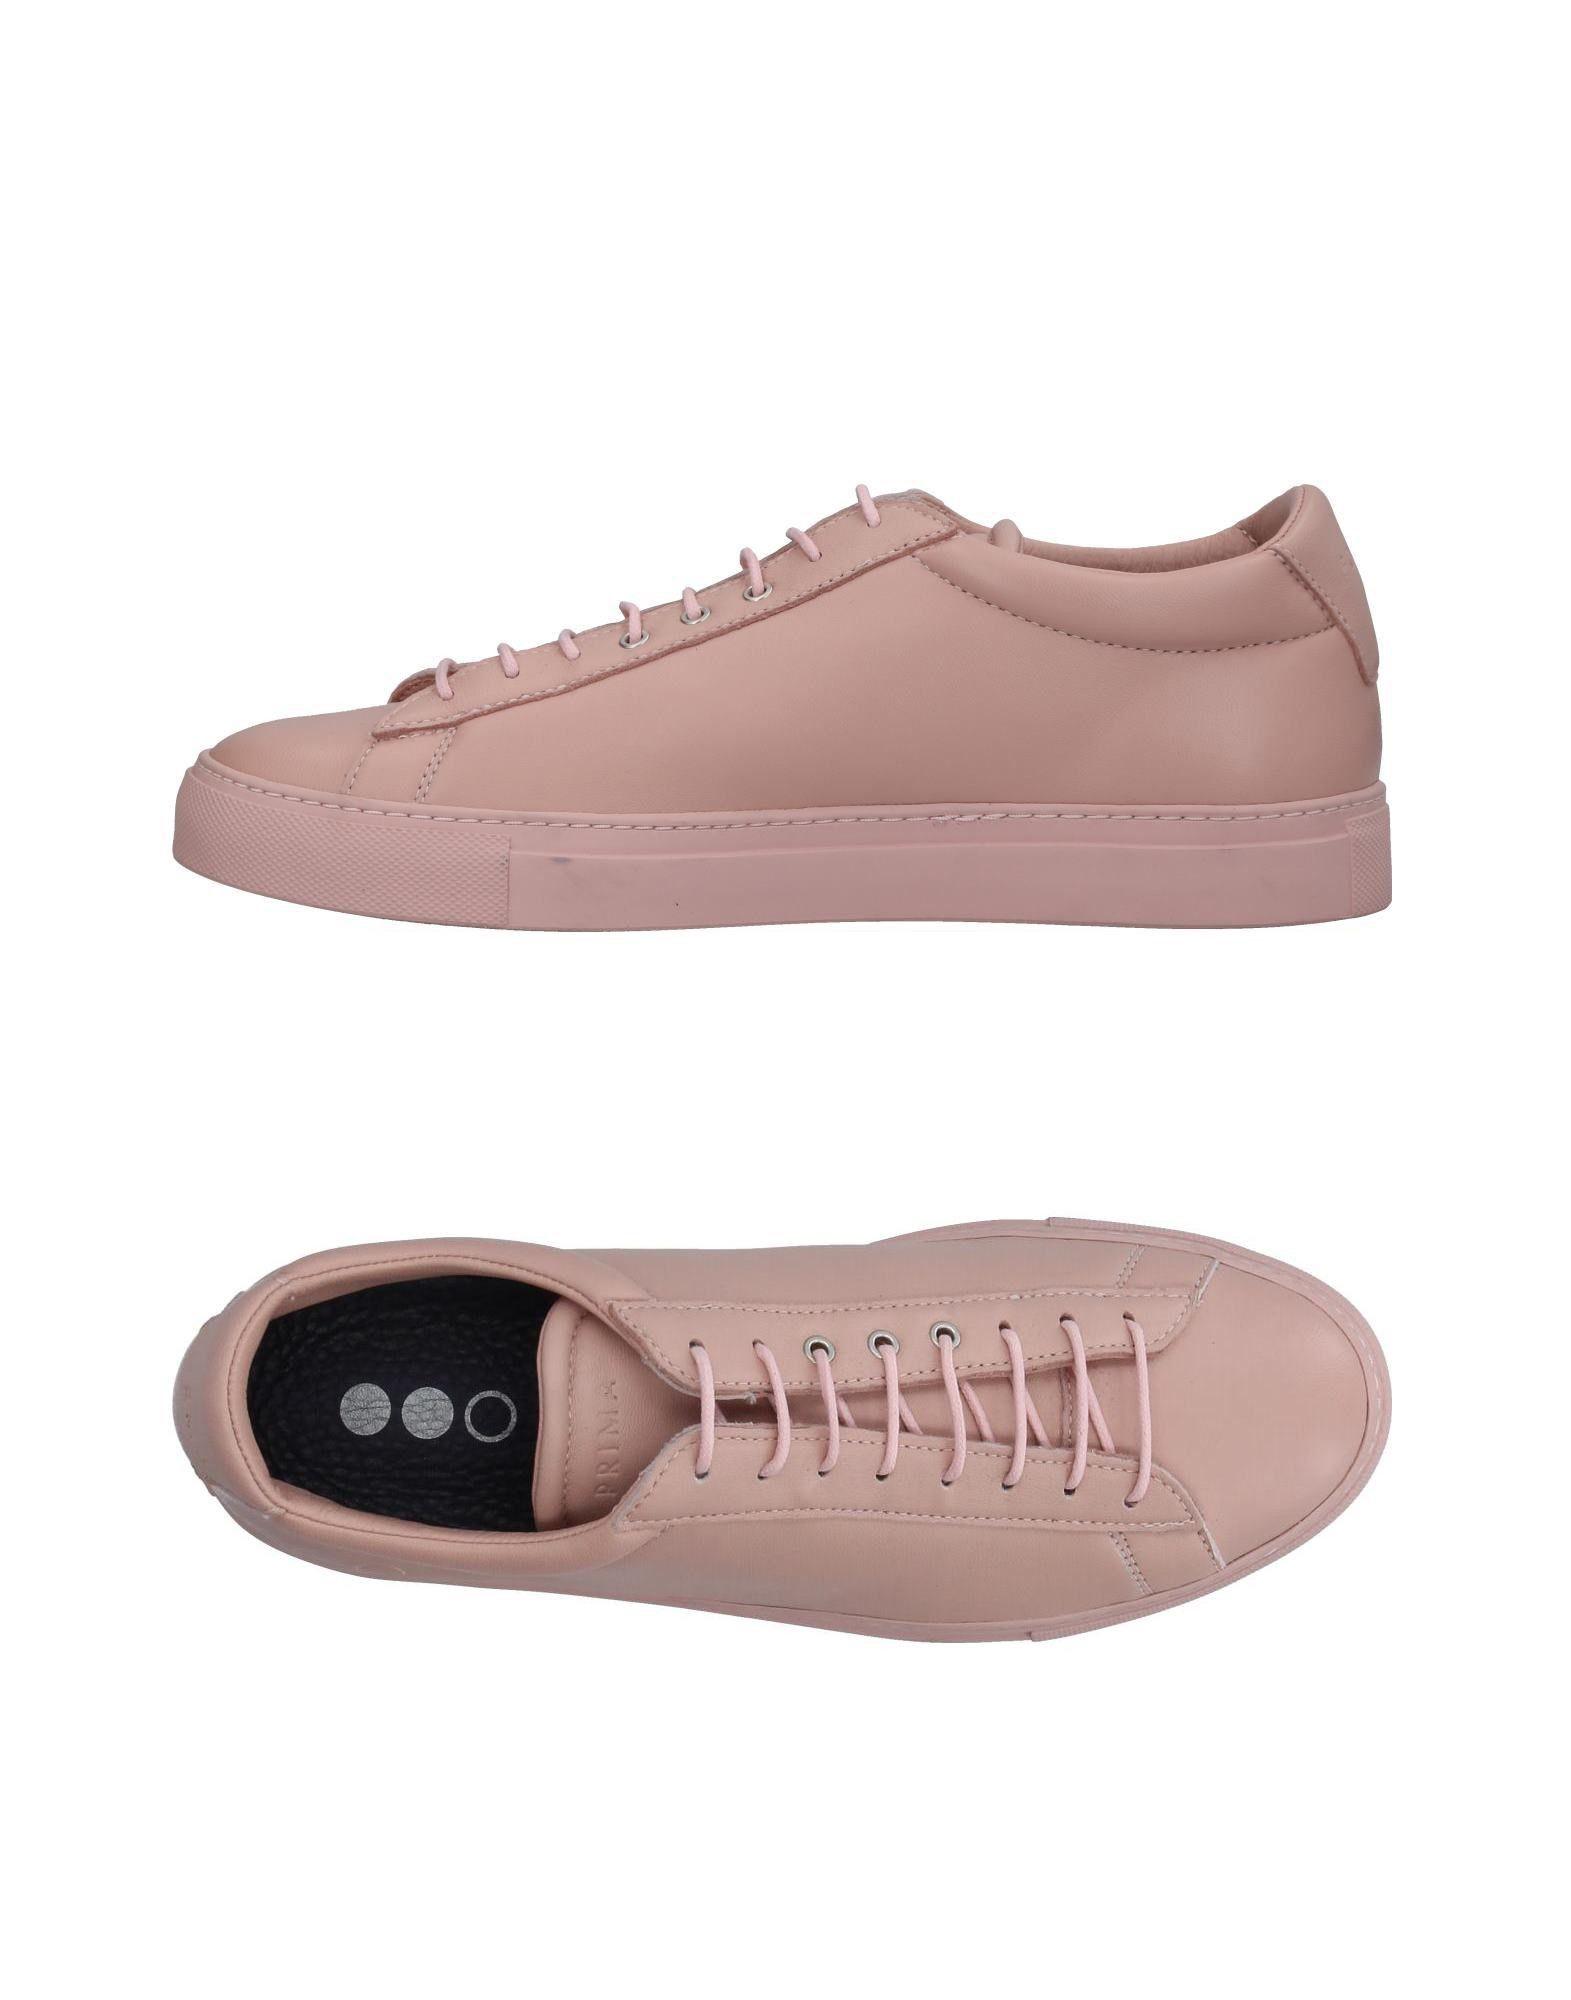 Primaforma Sneakers Damen  11401155PA 11401155PA  Gute Qualität beliebte Schuhe 3f26c5